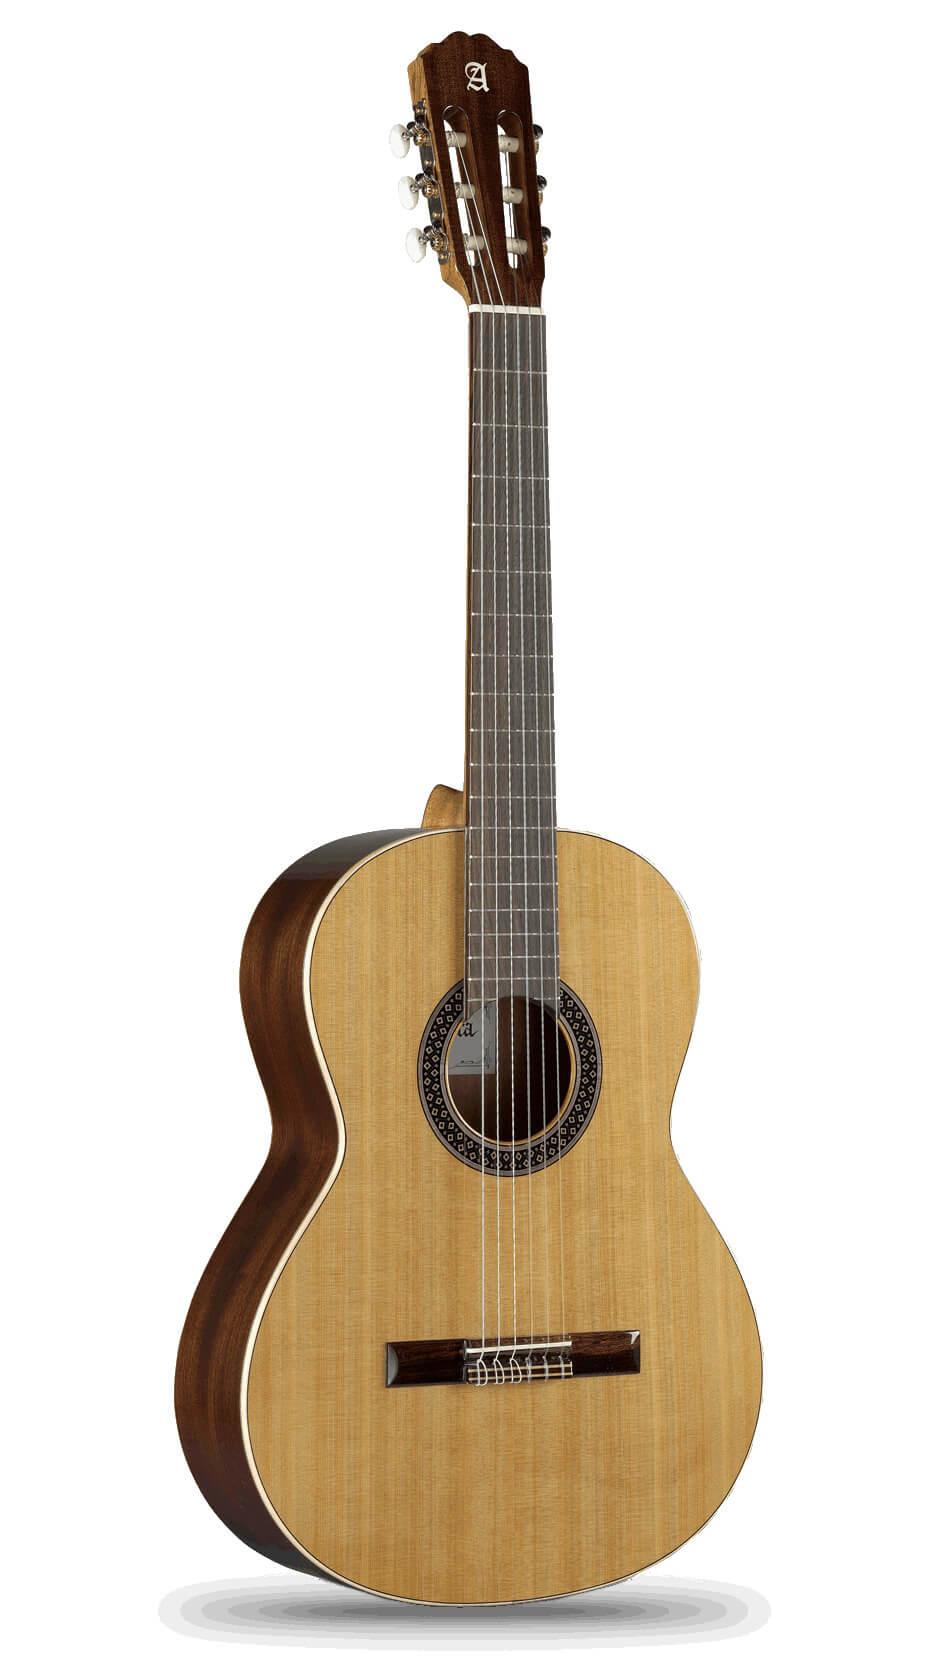 Guitarra Clasica Alhambra 1C 7/8 Señorita OP